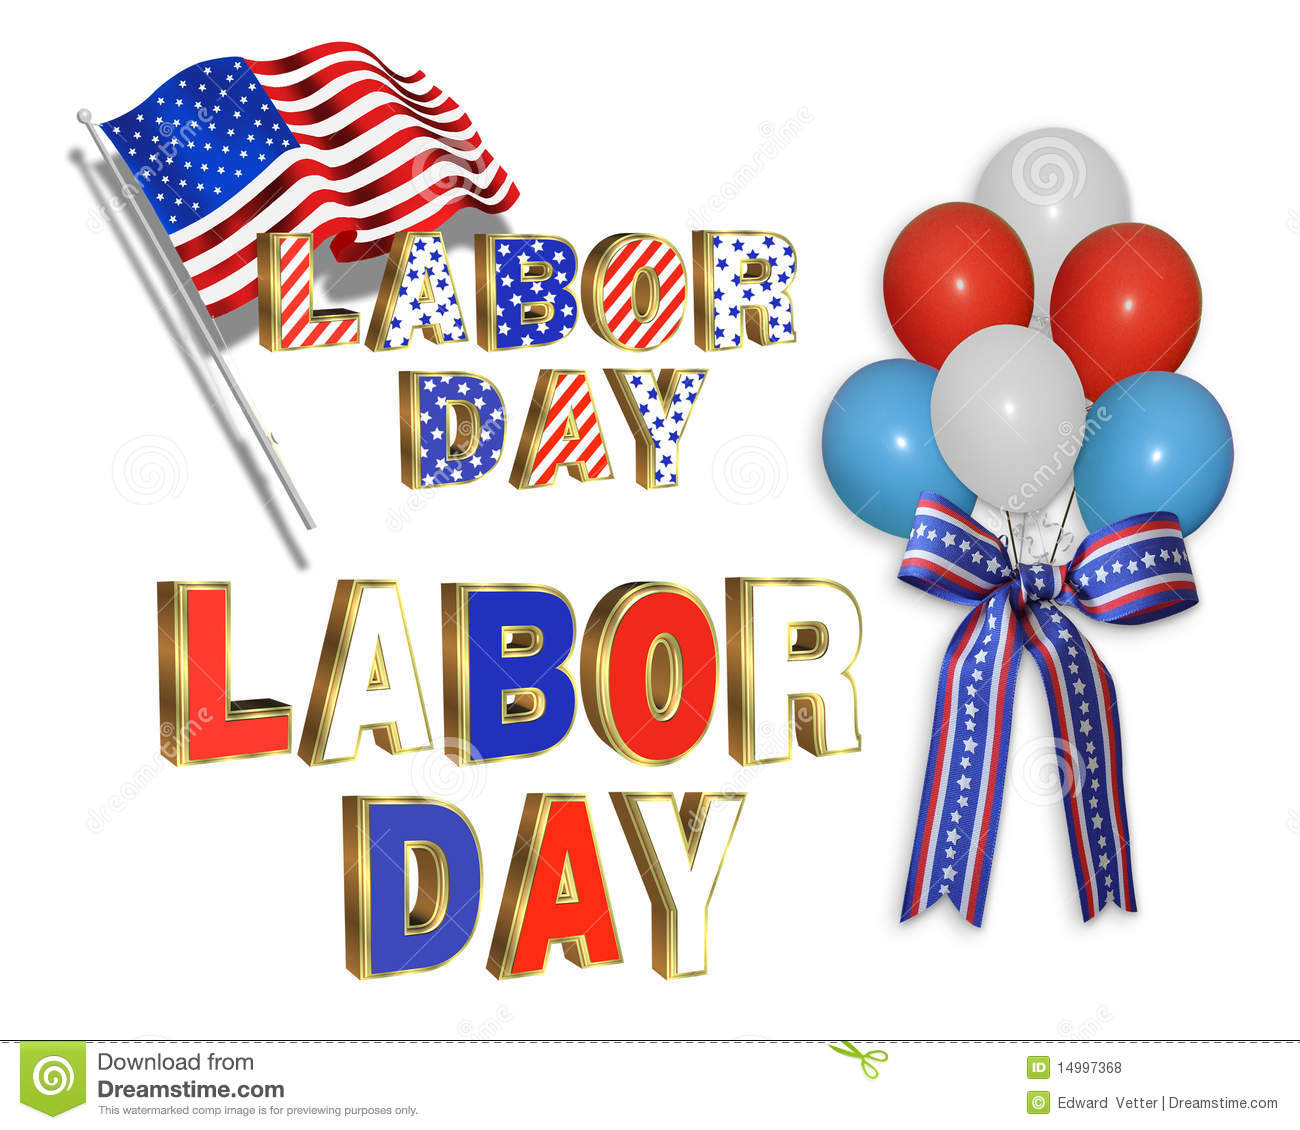 labor day clip art clipart panda free clipart images clip art labor day images clip art labor day free